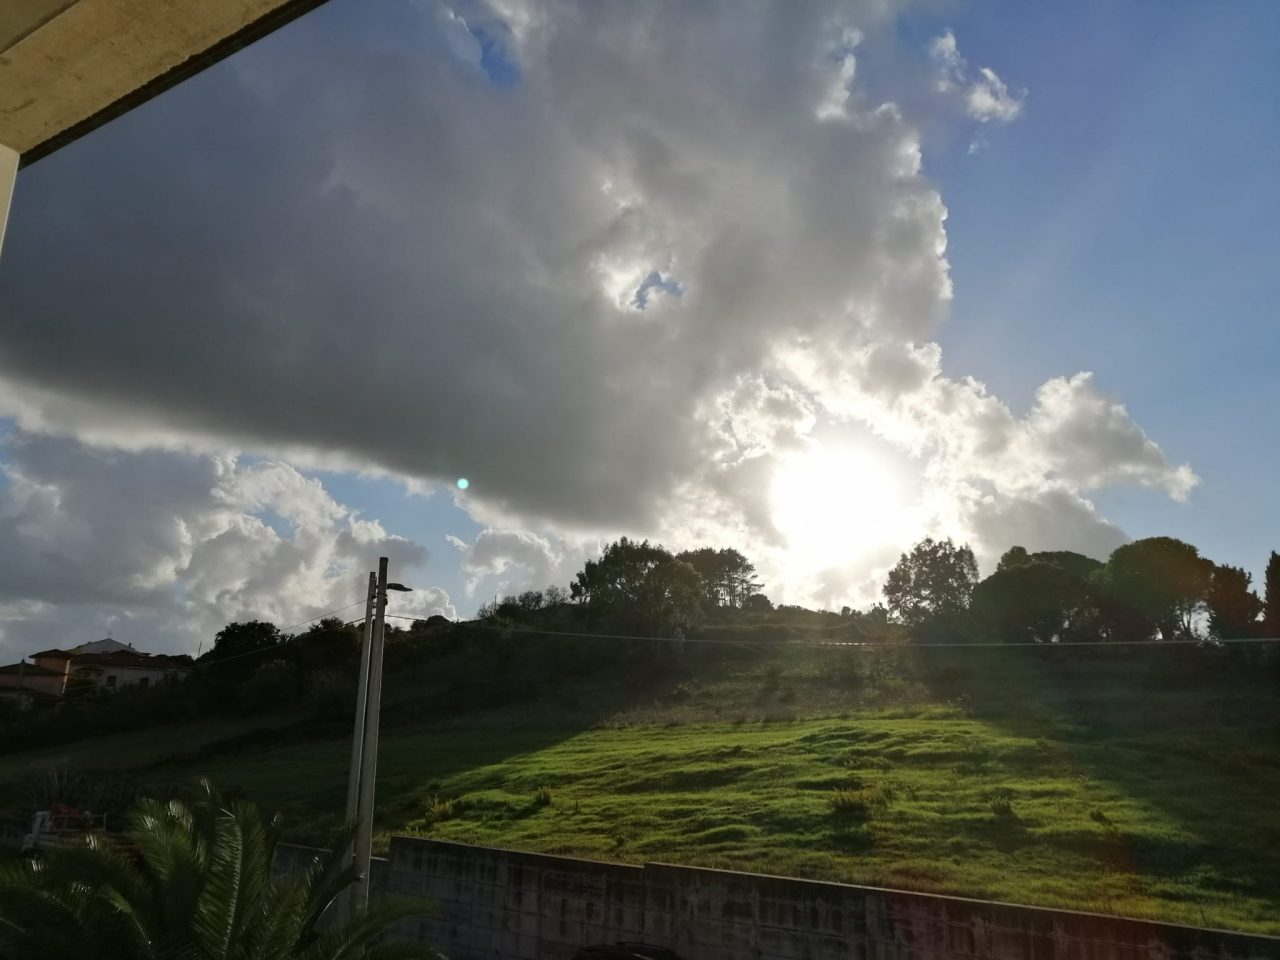 WhatsApp Image 2020 10 16 at 15.12.05 scaled - Sardegna, ancora meteo variabile. Foto da Ploaghe, Sassari